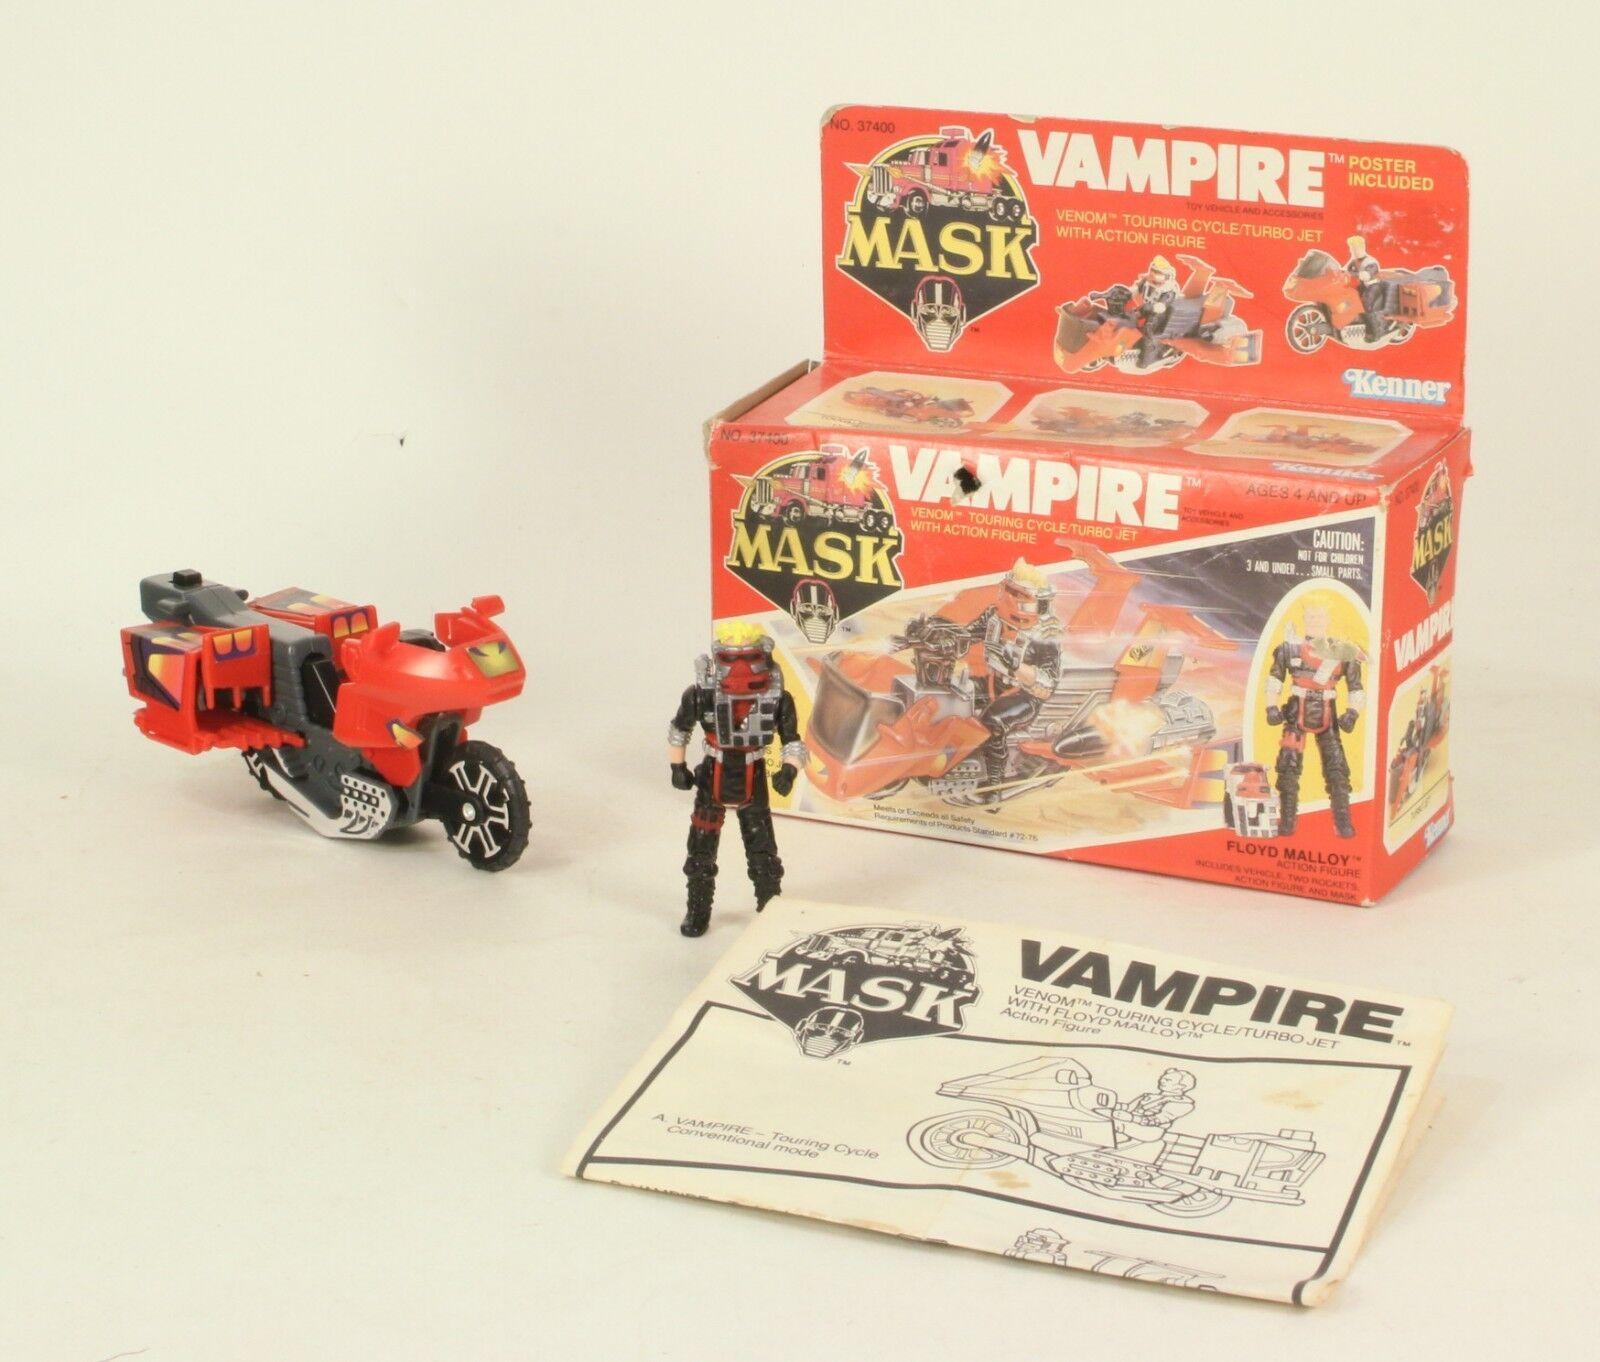 M.a.s.k. von kenner 1986 vampir & floyd malloy & original box - maske